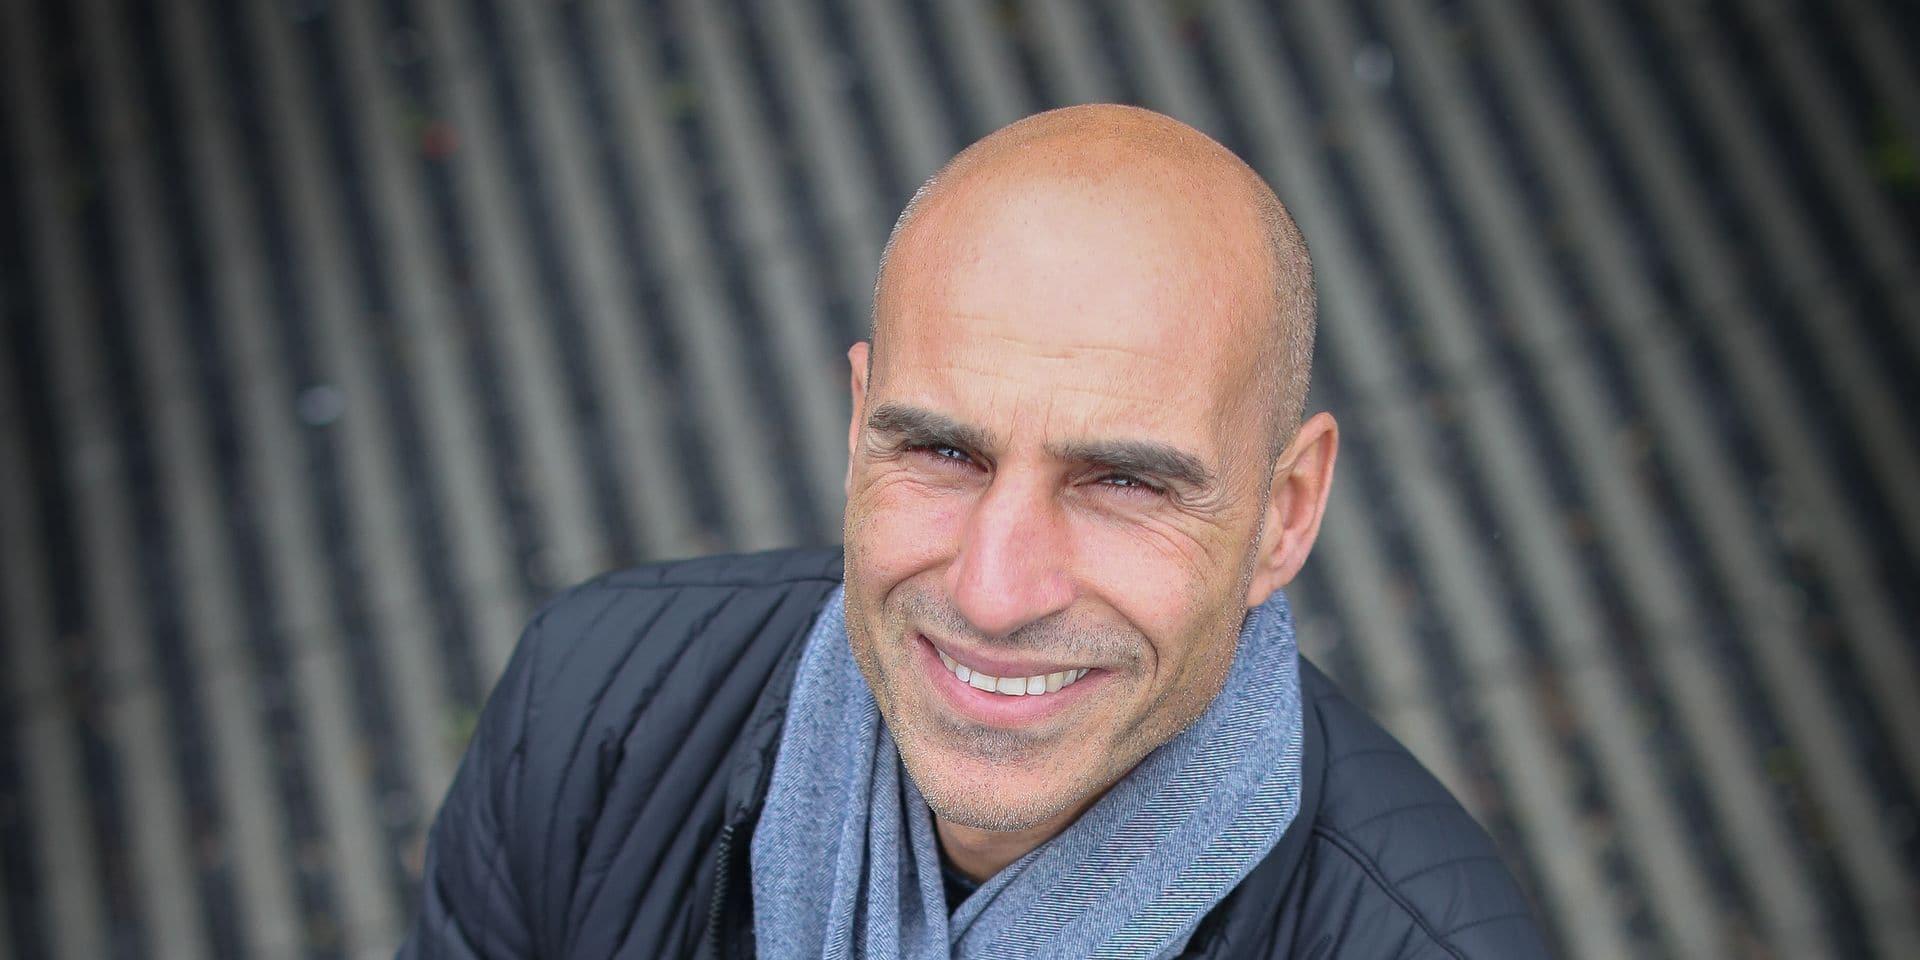 Photos Bernard Demoulin : Toni Brogno ancien joueur de Charleroi